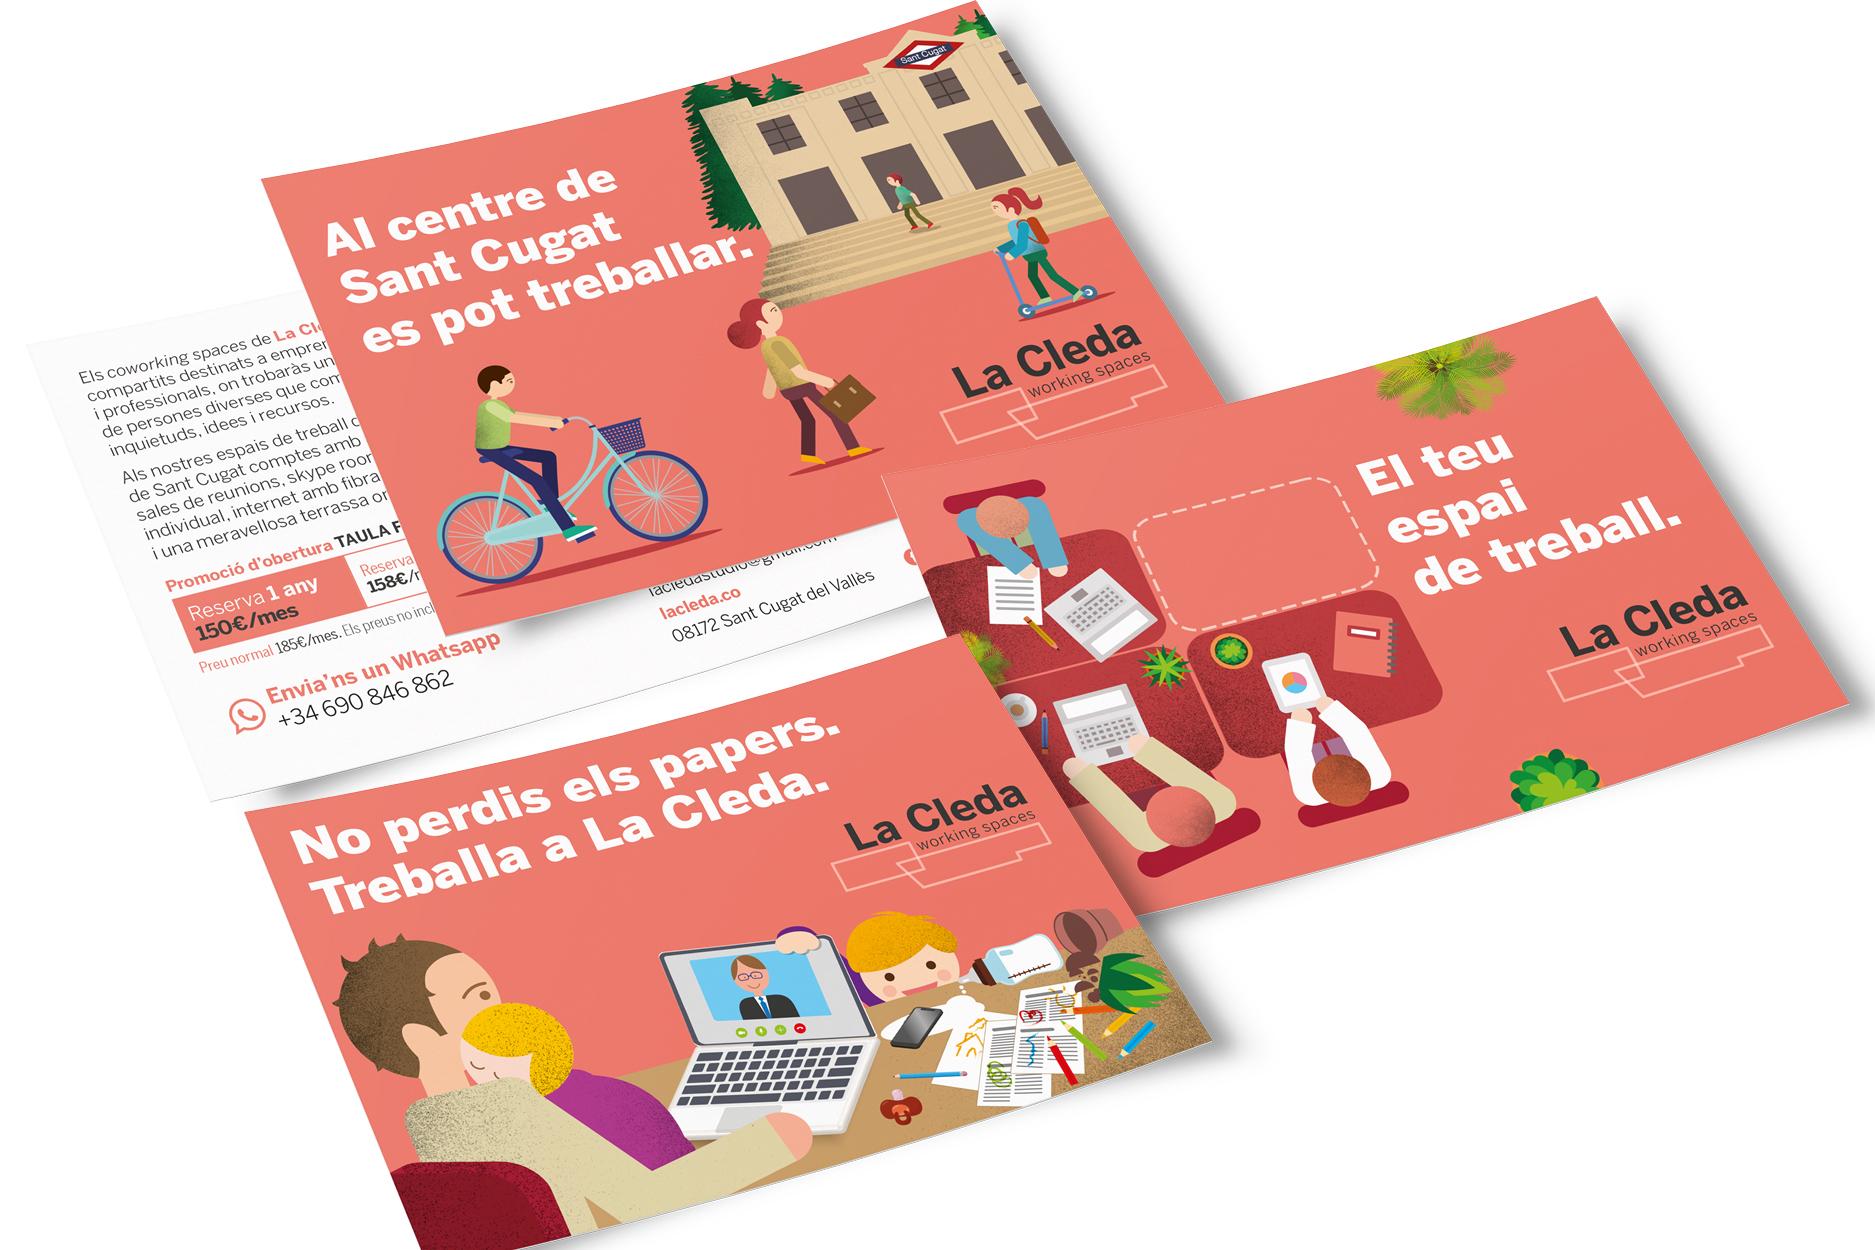 La Cleda_web8.jpg